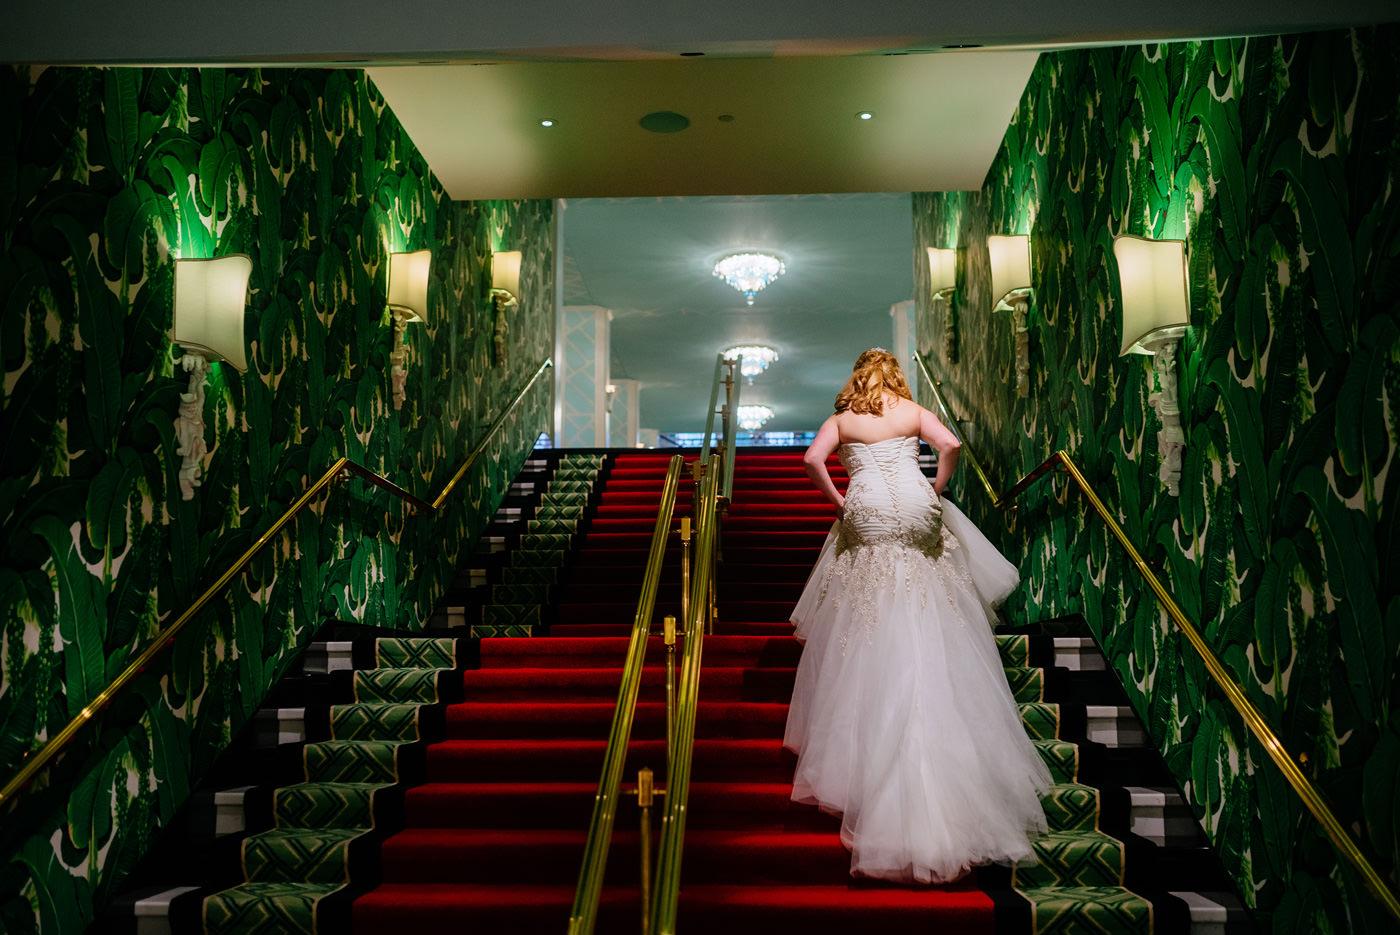 dorothy draper carlton varney greenbrier bridal photos